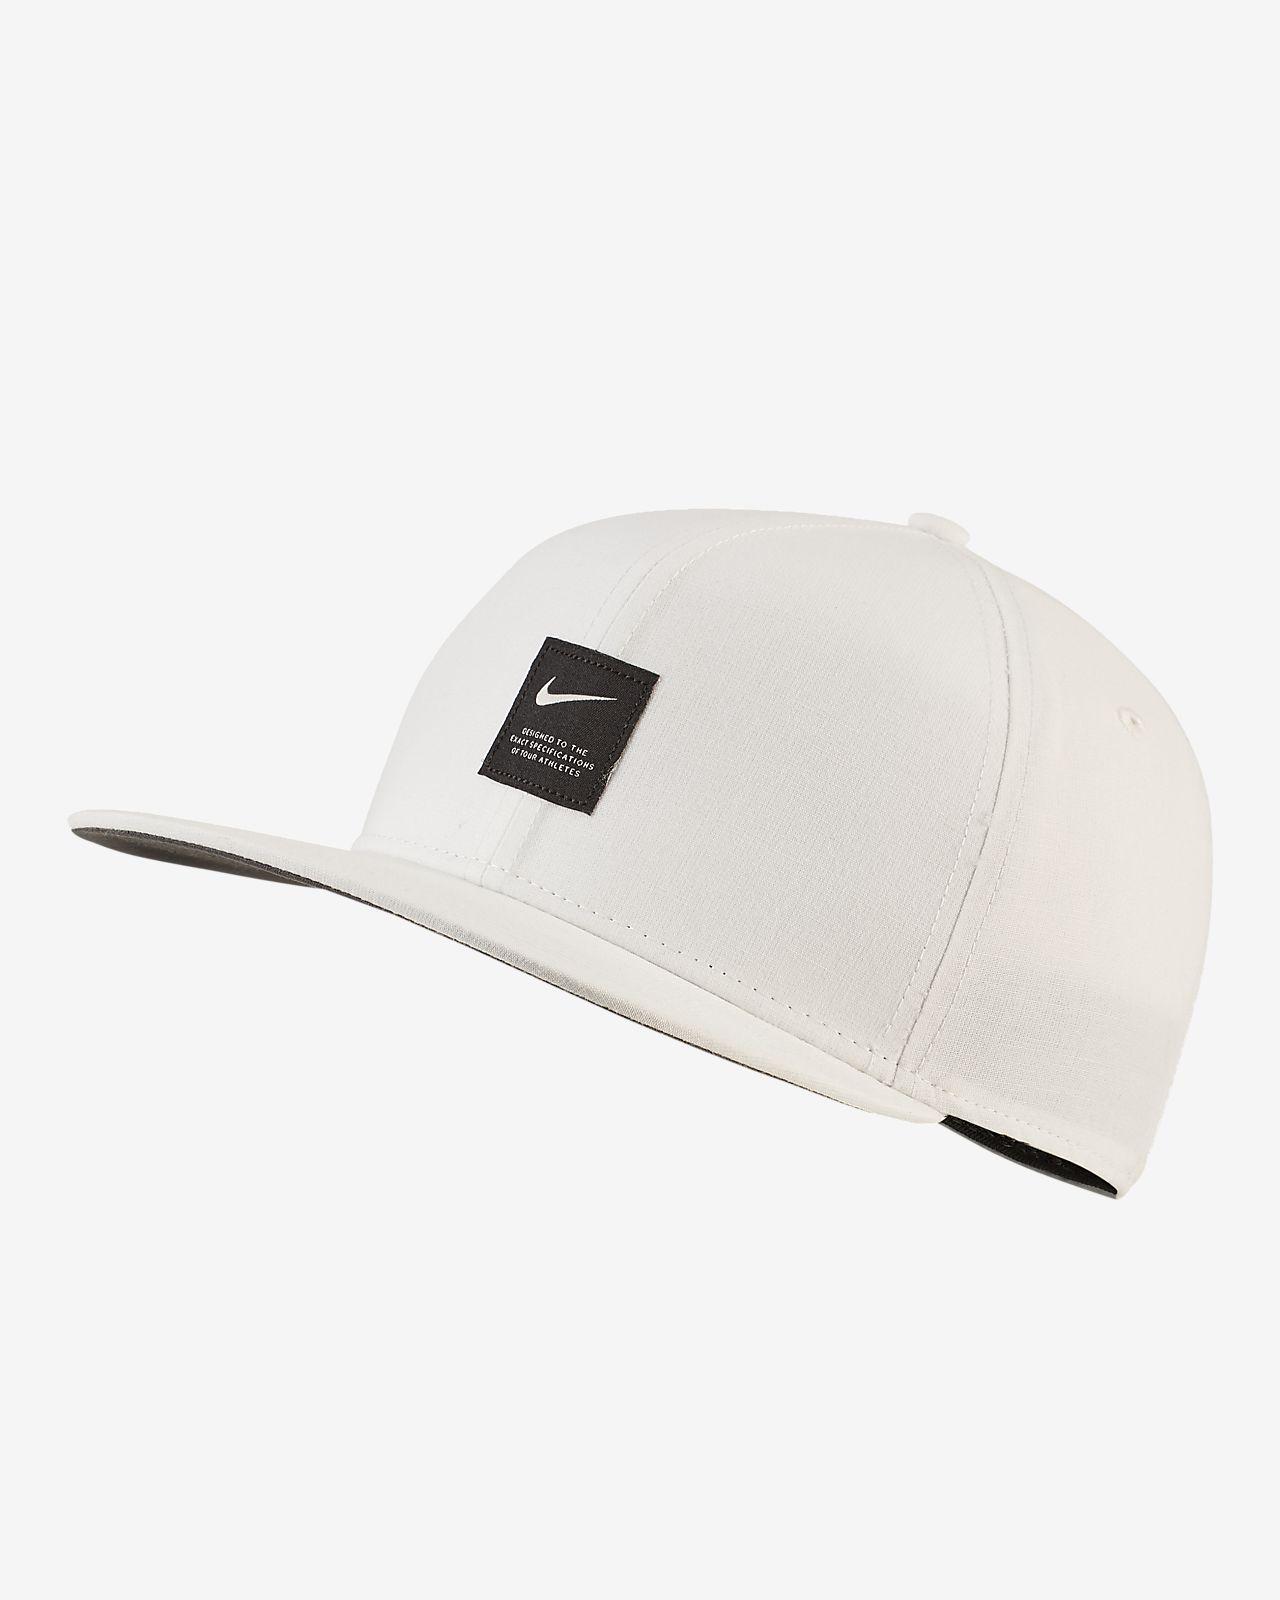 1e92e7b48f1 Nike AeroBill Golf Hat. Nike.com